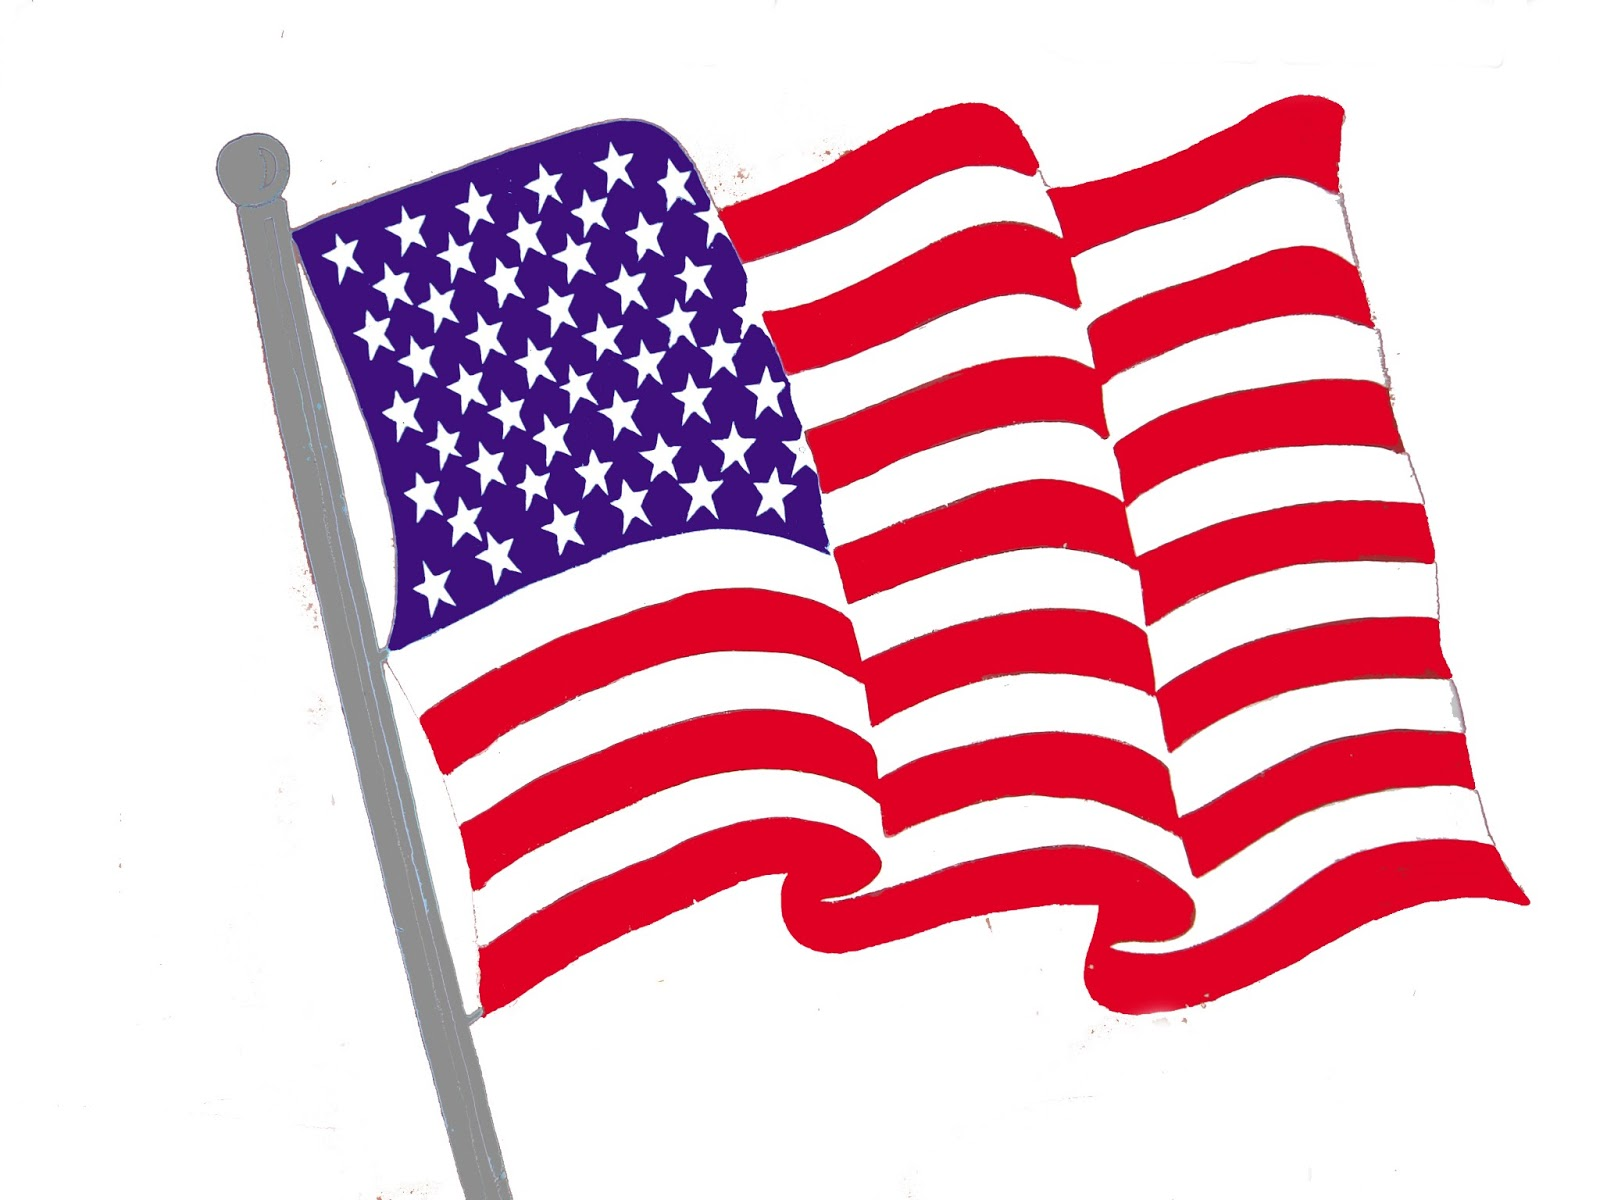 1600x1200 American Flag Clipart Free Graphics United States Flag Ima